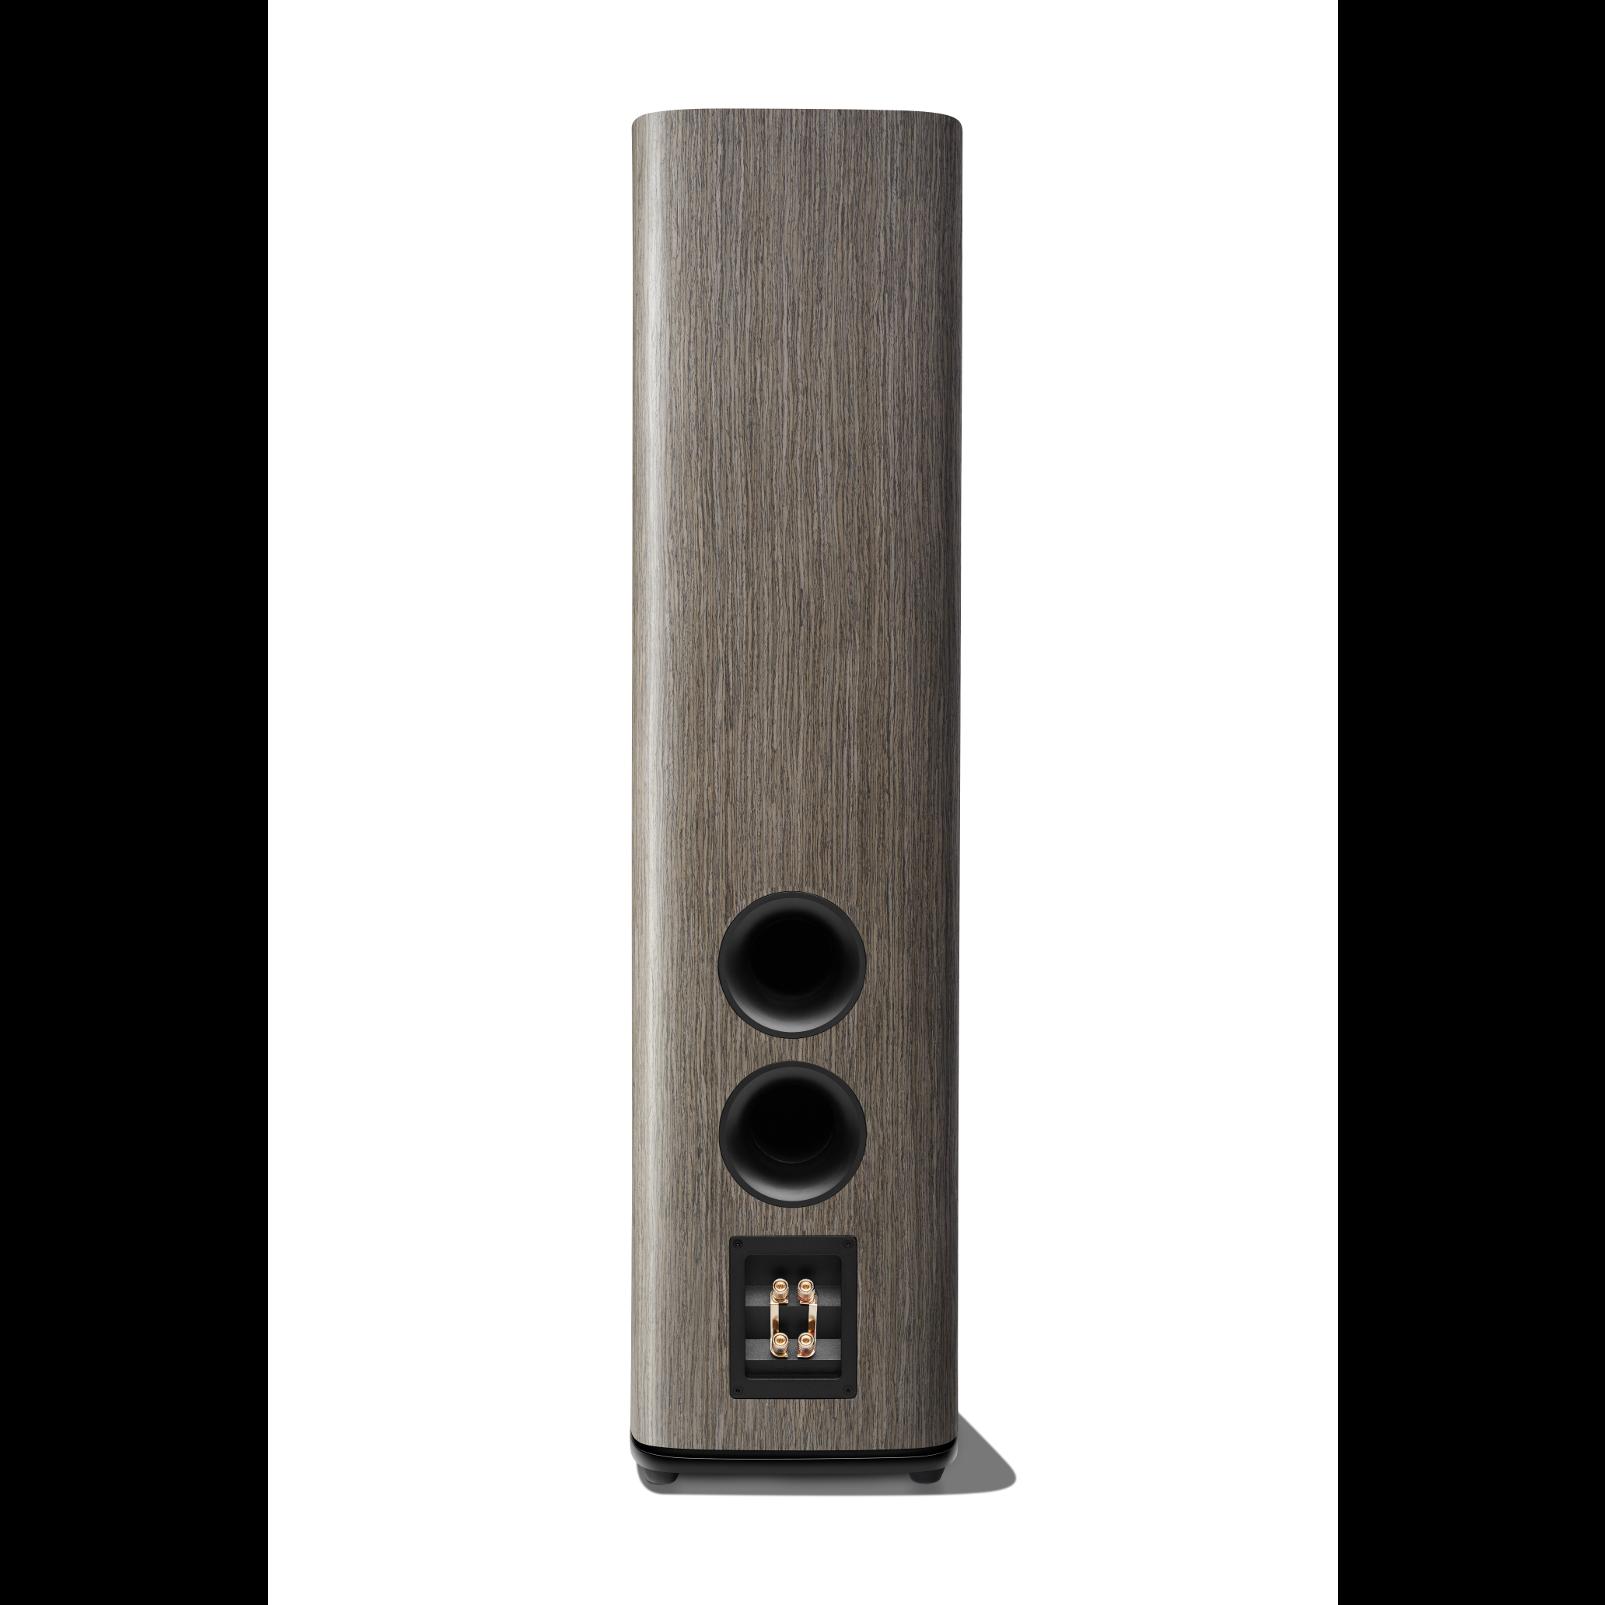 HDI-3600 - Grey Oak - 2 ½-way Triple 6.5-inch (165mm) Floorstanding Loudspeaker - Back